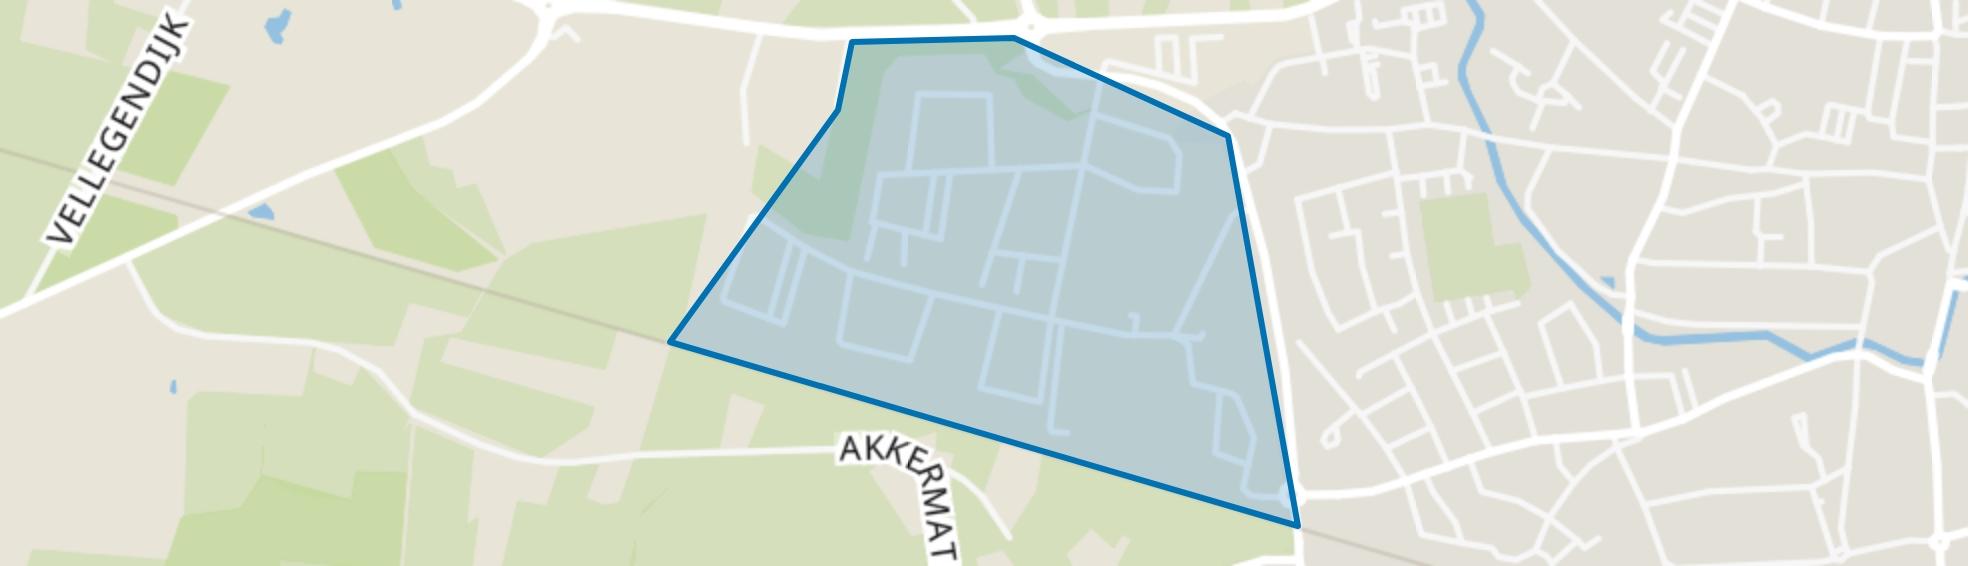 Aalten Kern 't Kobus, Aalten map